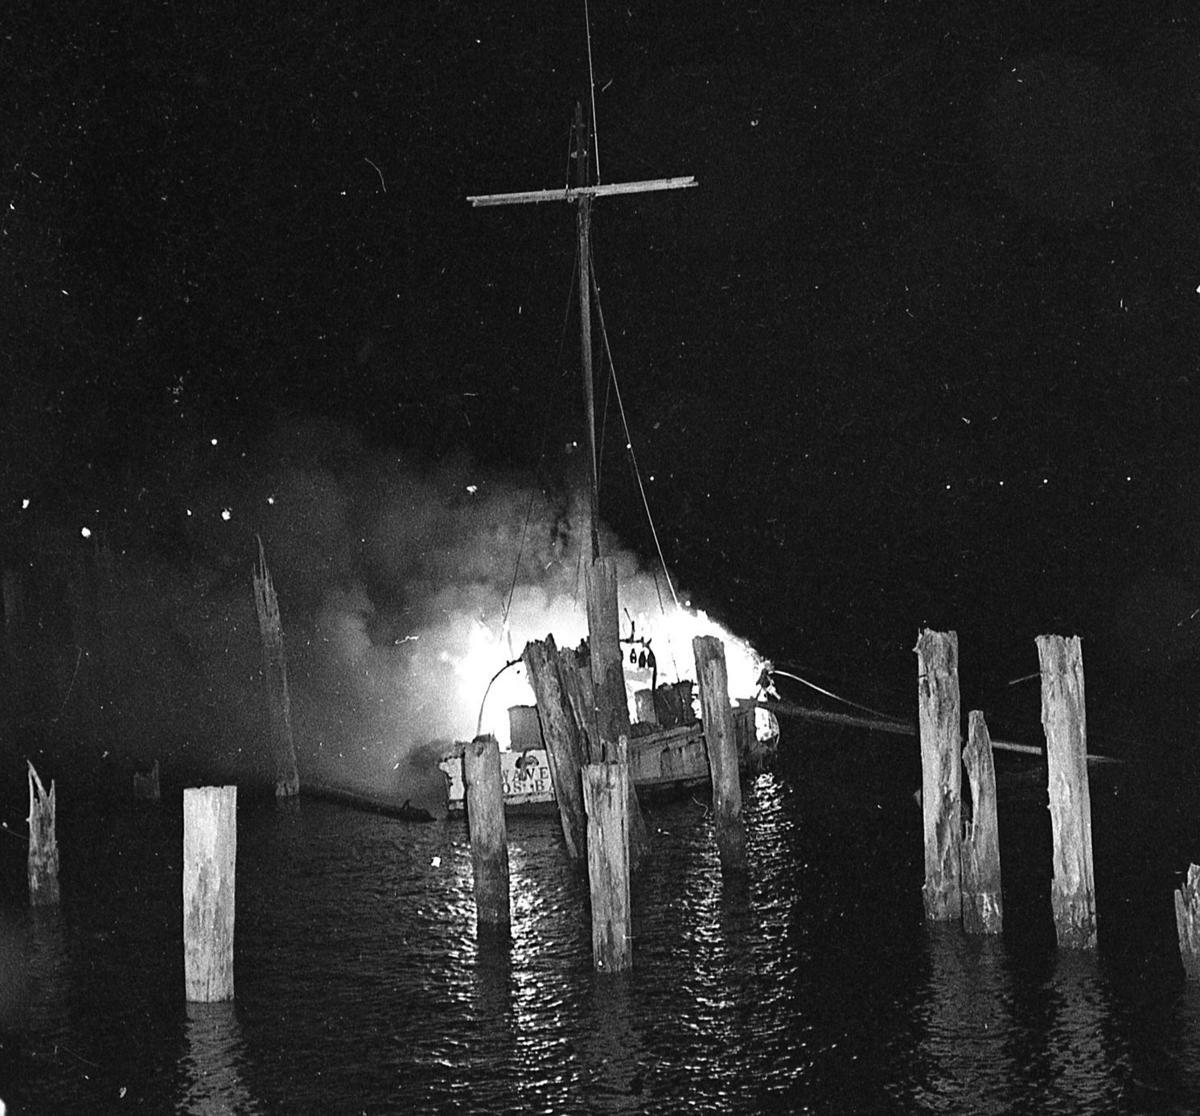 FV Waves, owned by Mike Erdman, burns near pilings behind MM truck shop, Aug. 1977,